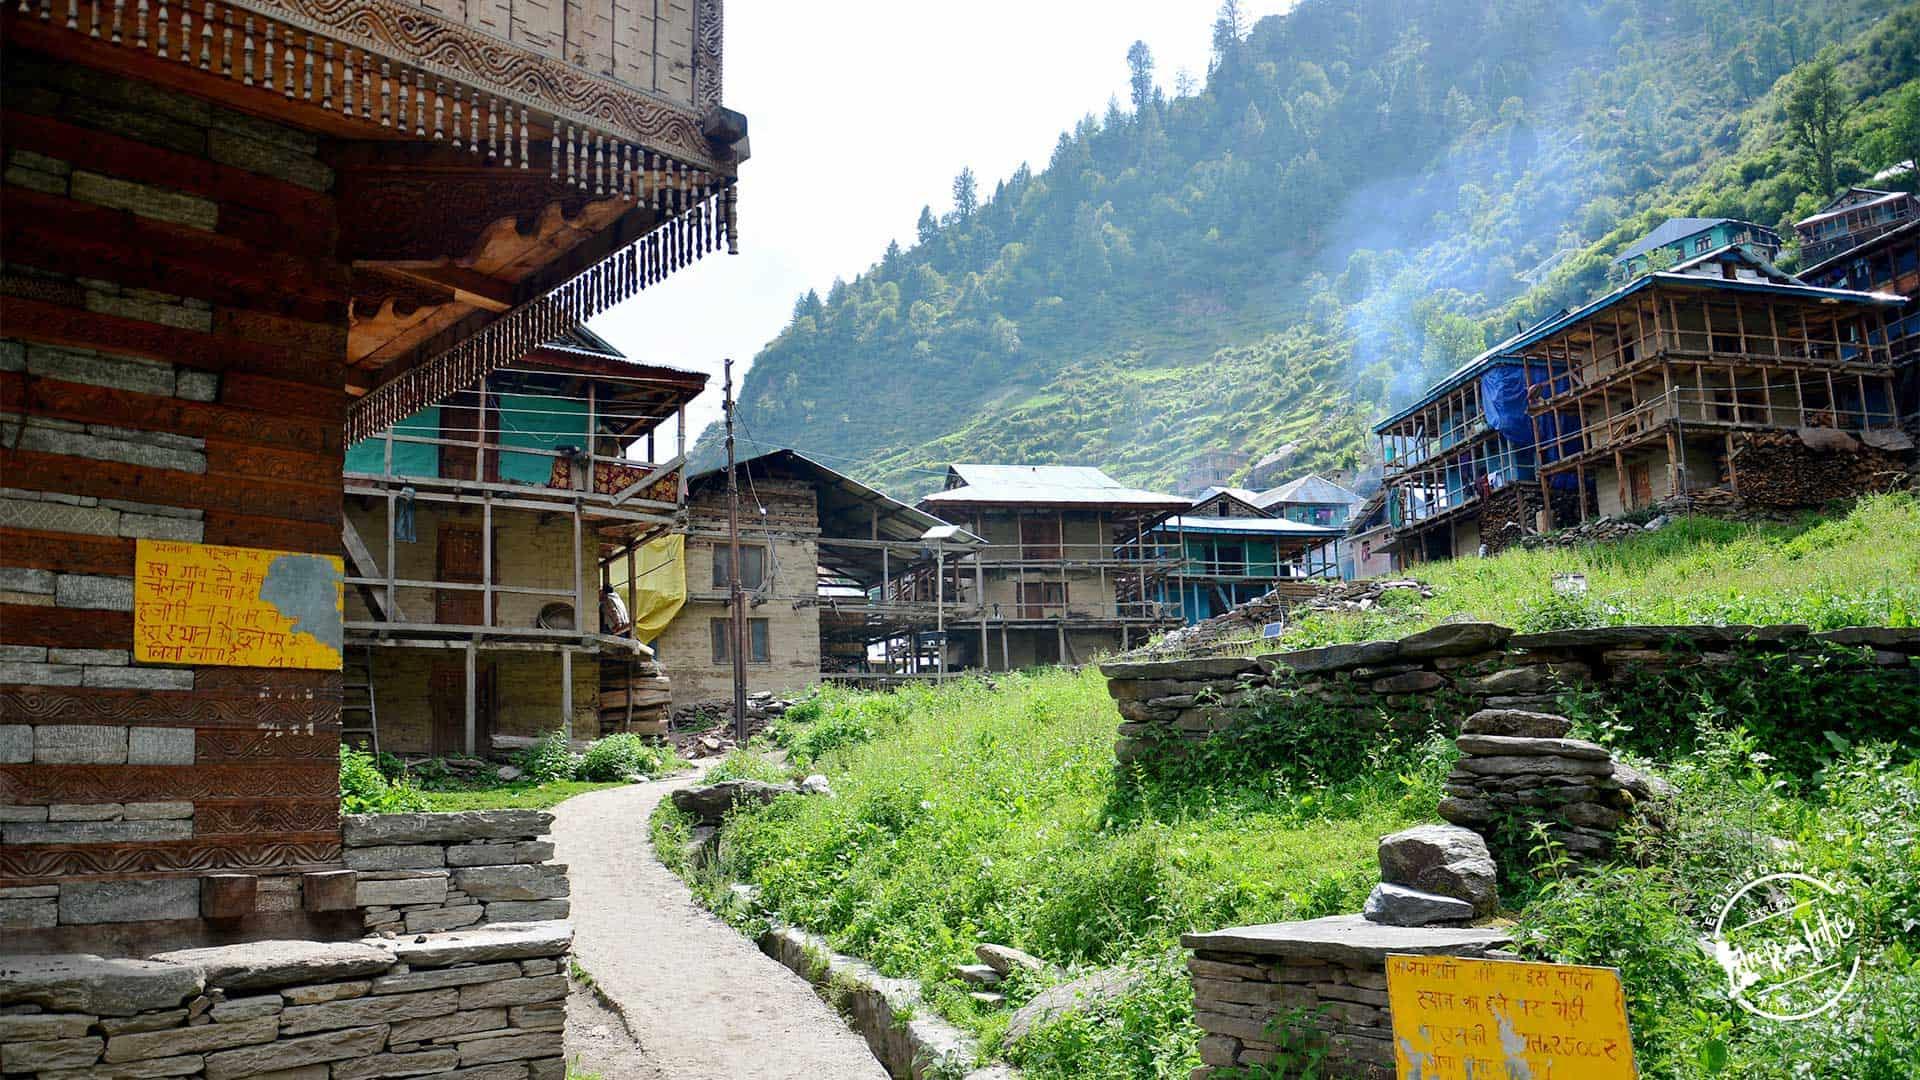 Malana - Trek to parvati valley